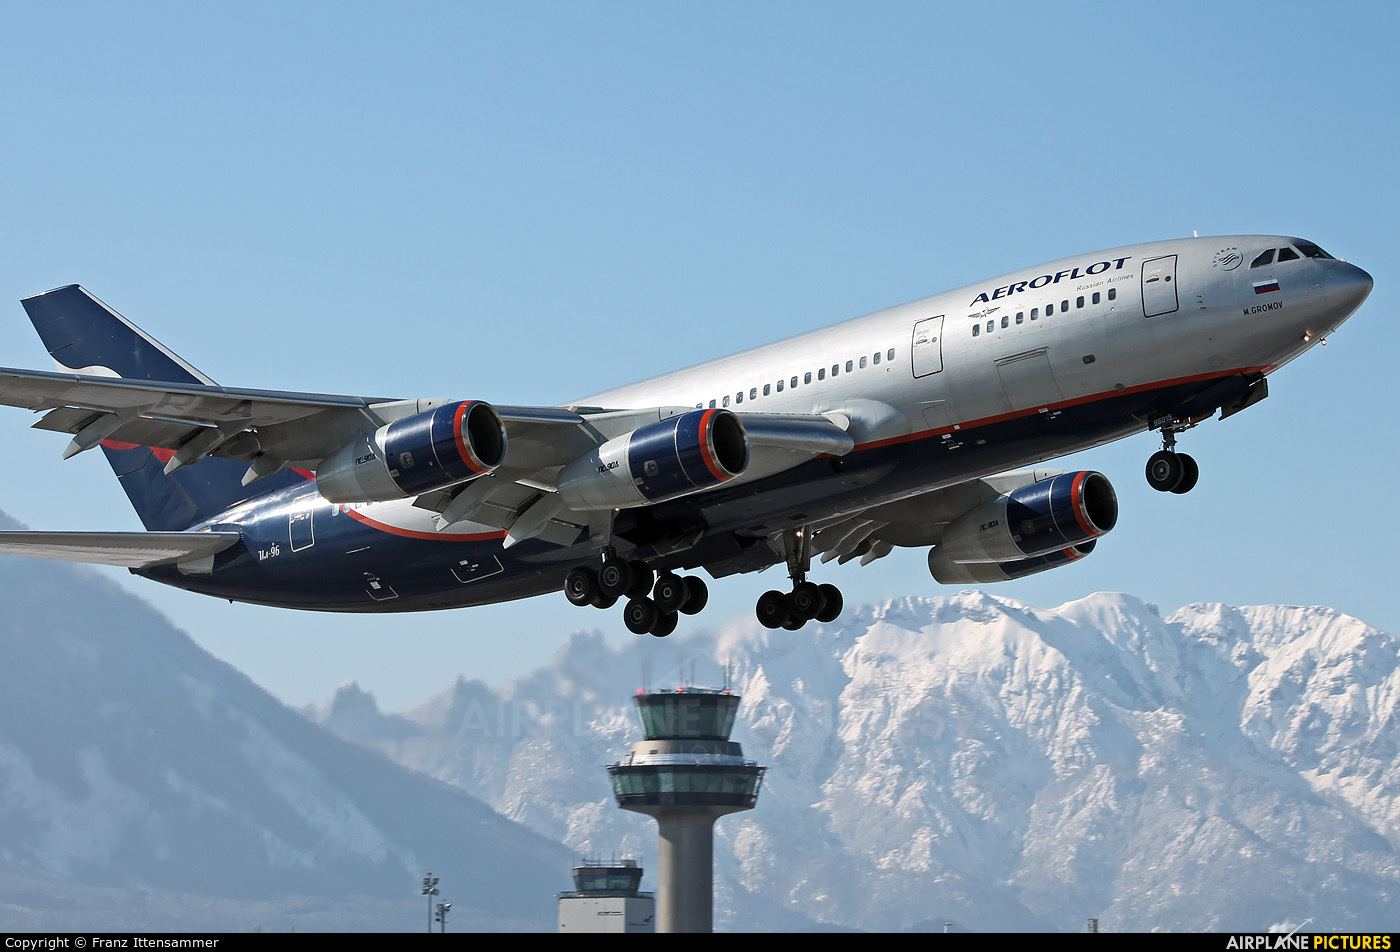 Aeroflot RA-96015 aircraft at Salzburg